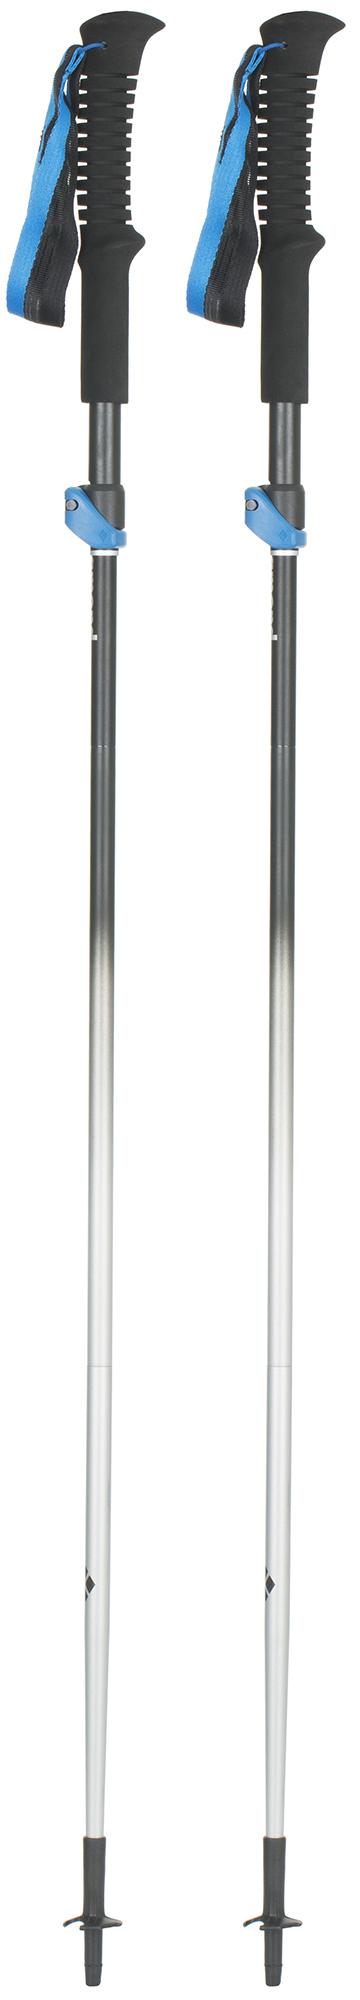 Black Diamond Палки телескопические Black Diamond Dist Flz Z-Poles gzgmet spring ring for audio video cctv camera bnc female jack coupler wire connector